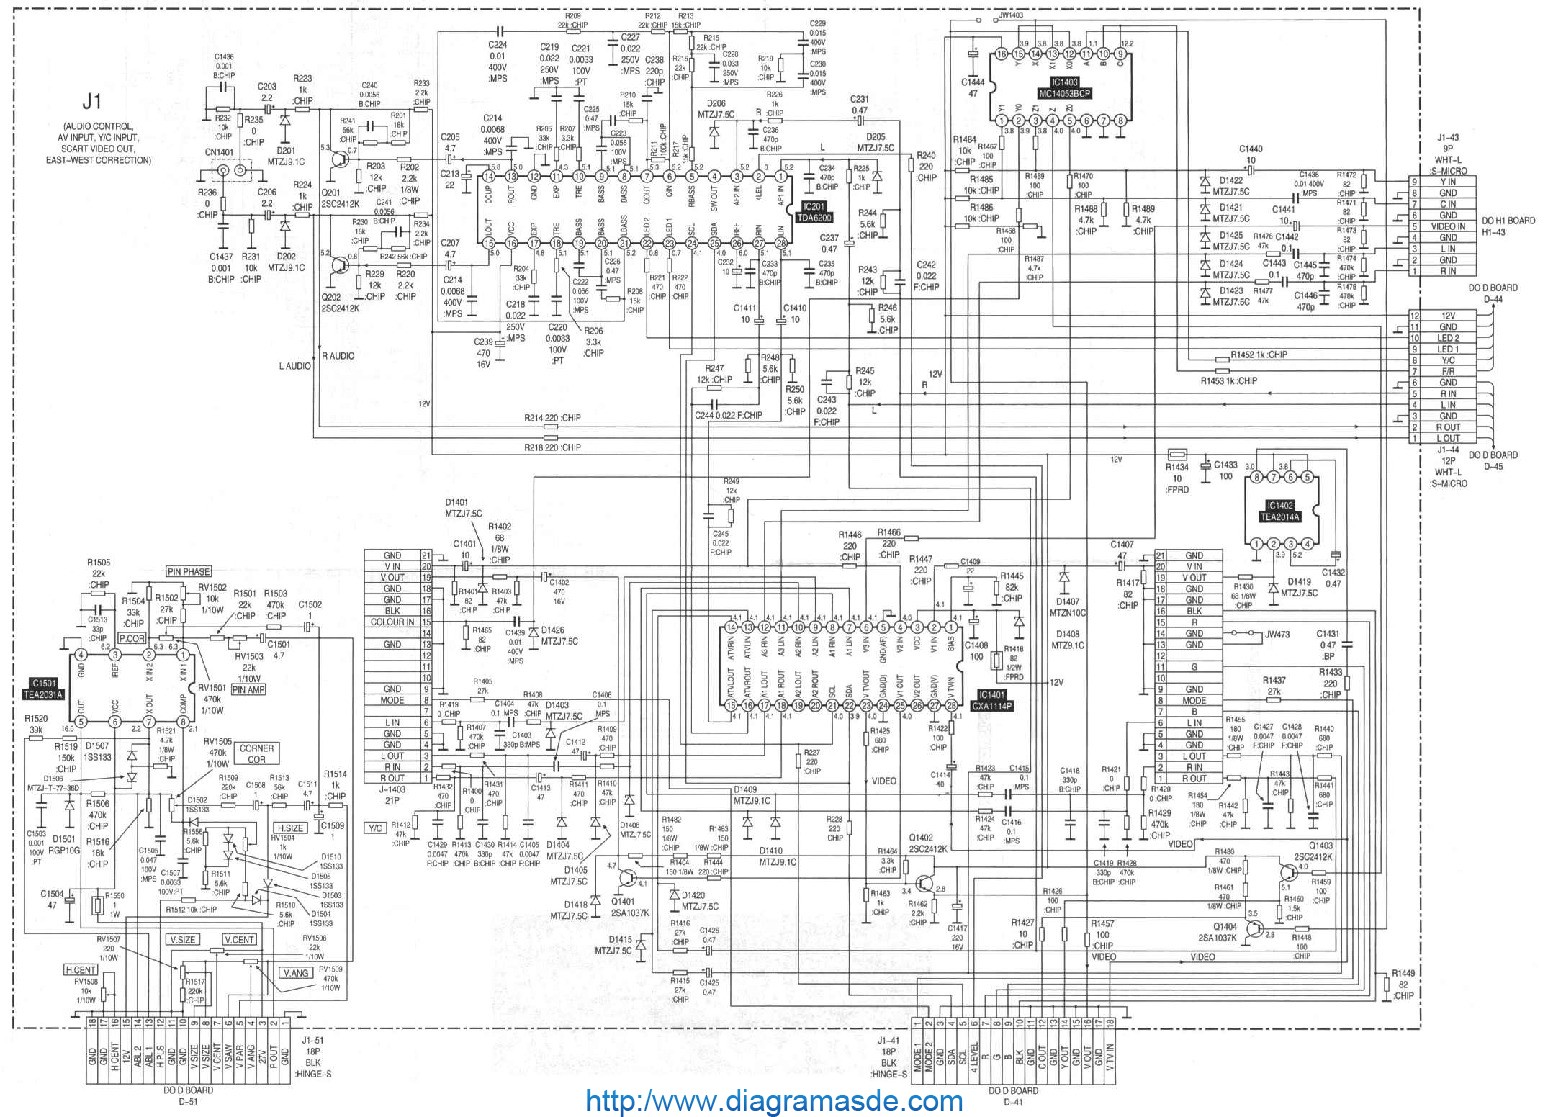 diagrama sony hcdgtx888